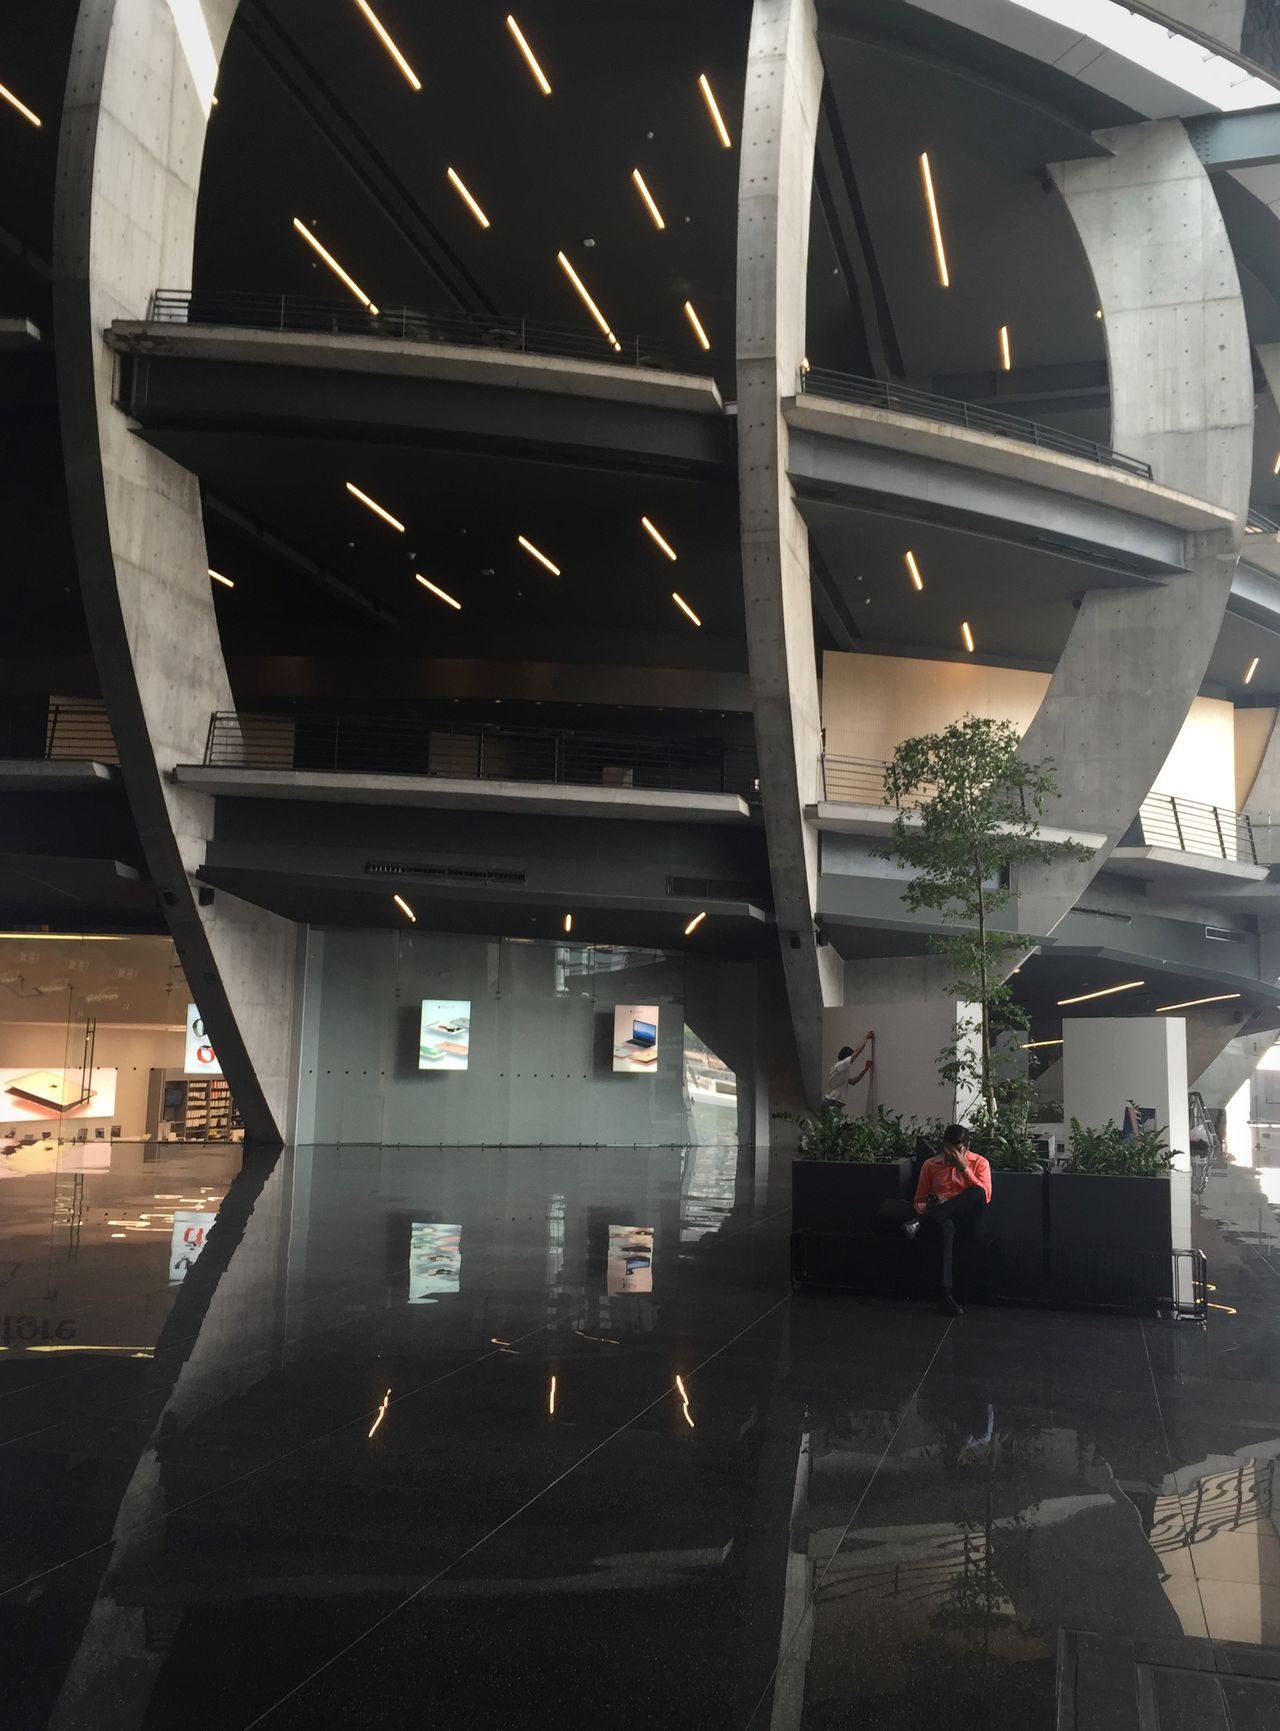 354 / 366 Agustin Landa Agustinlanda Architectural Column Architectural Feature Architecture Building Built Structure Column Illuminated Interior Modern Pabellon M PabellonM